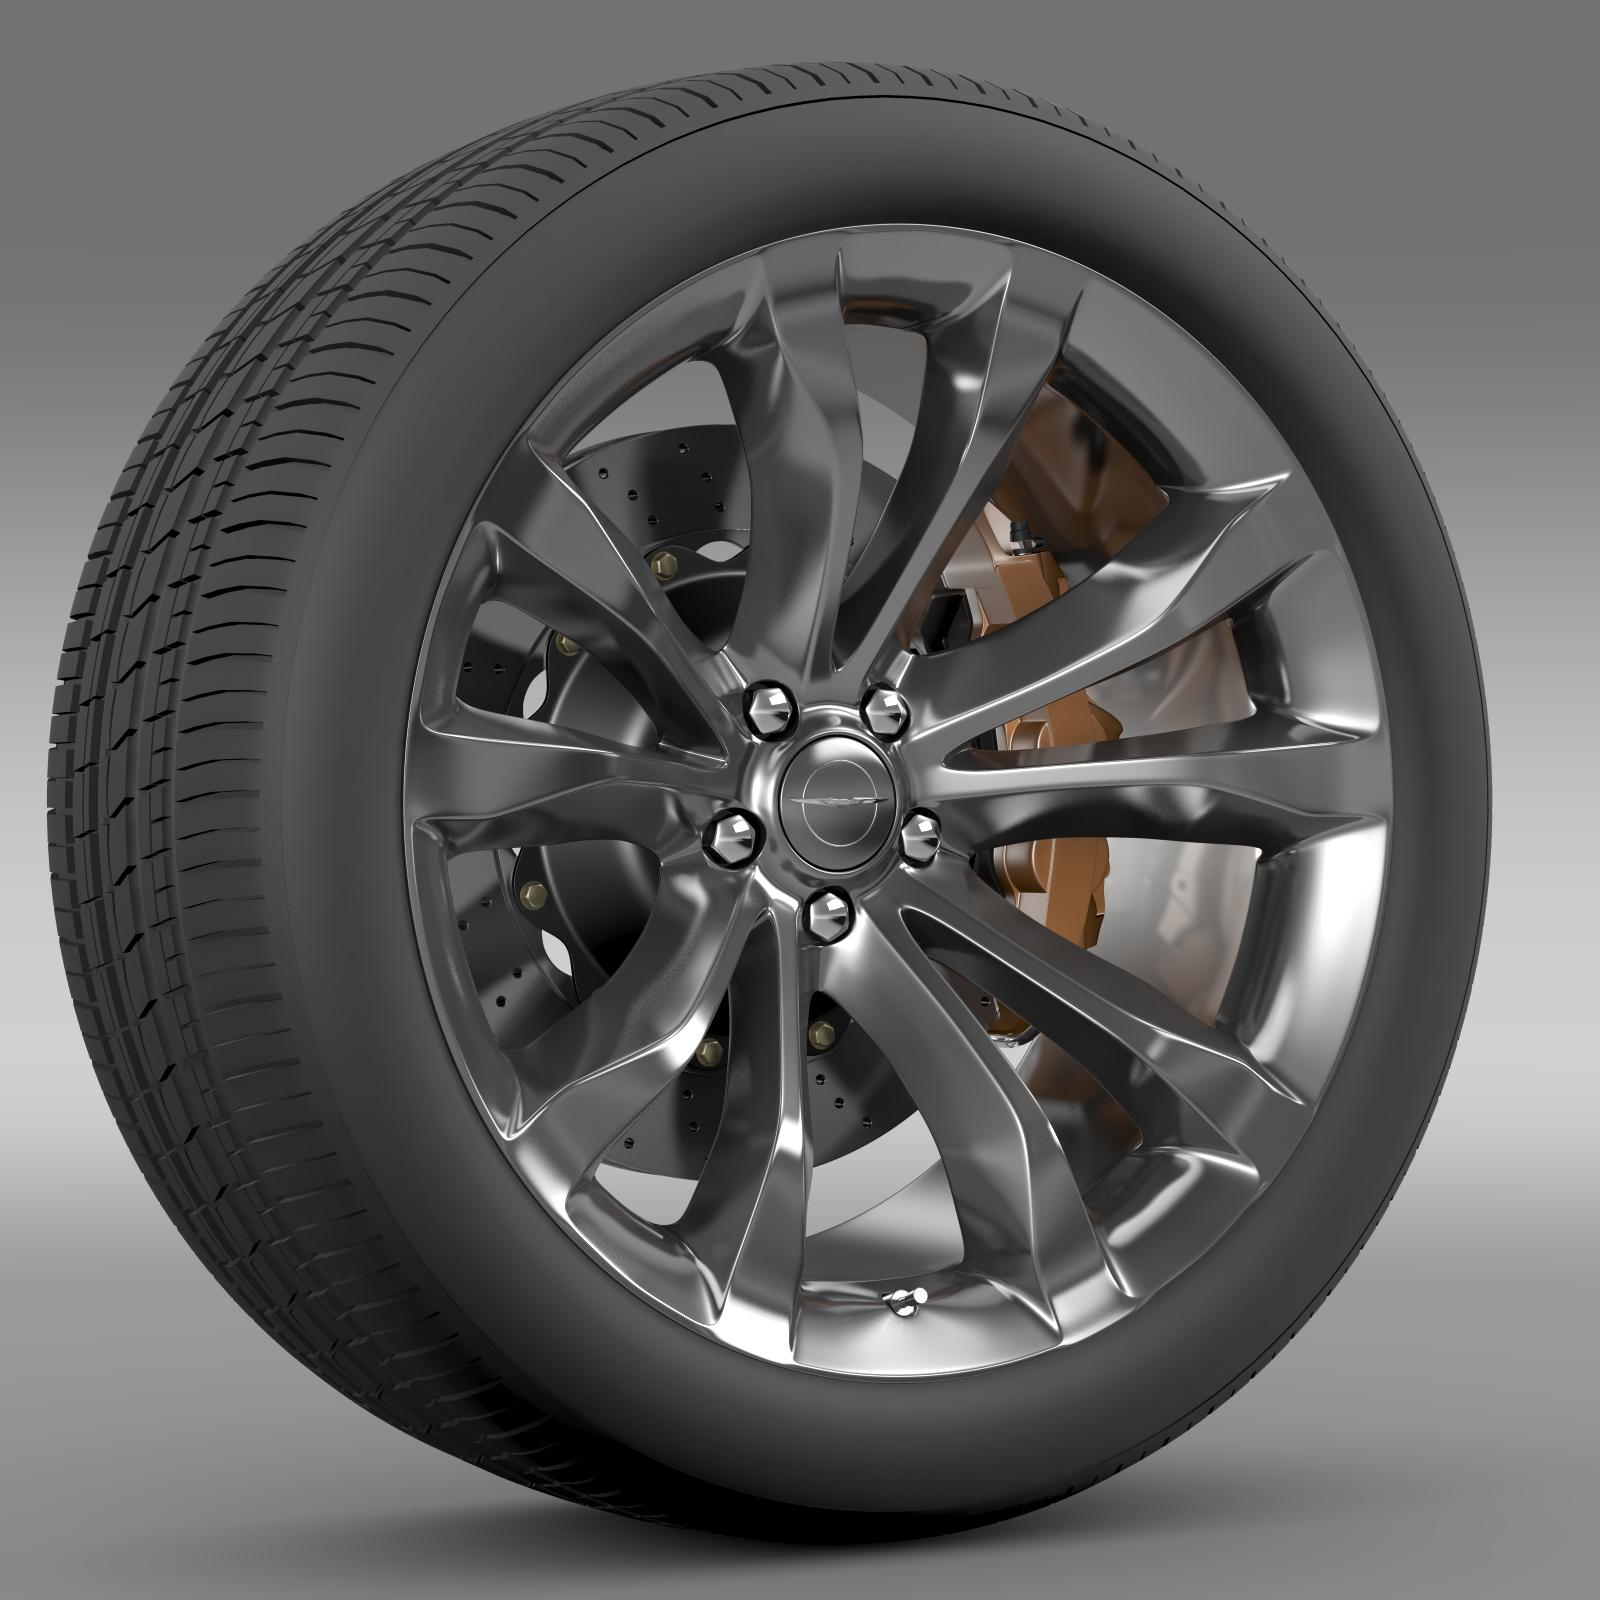 chrysler 300c platinum 2015 wheel 3d model 3ds max fbx c4d lwo ma mb hrc xsi obj 212778